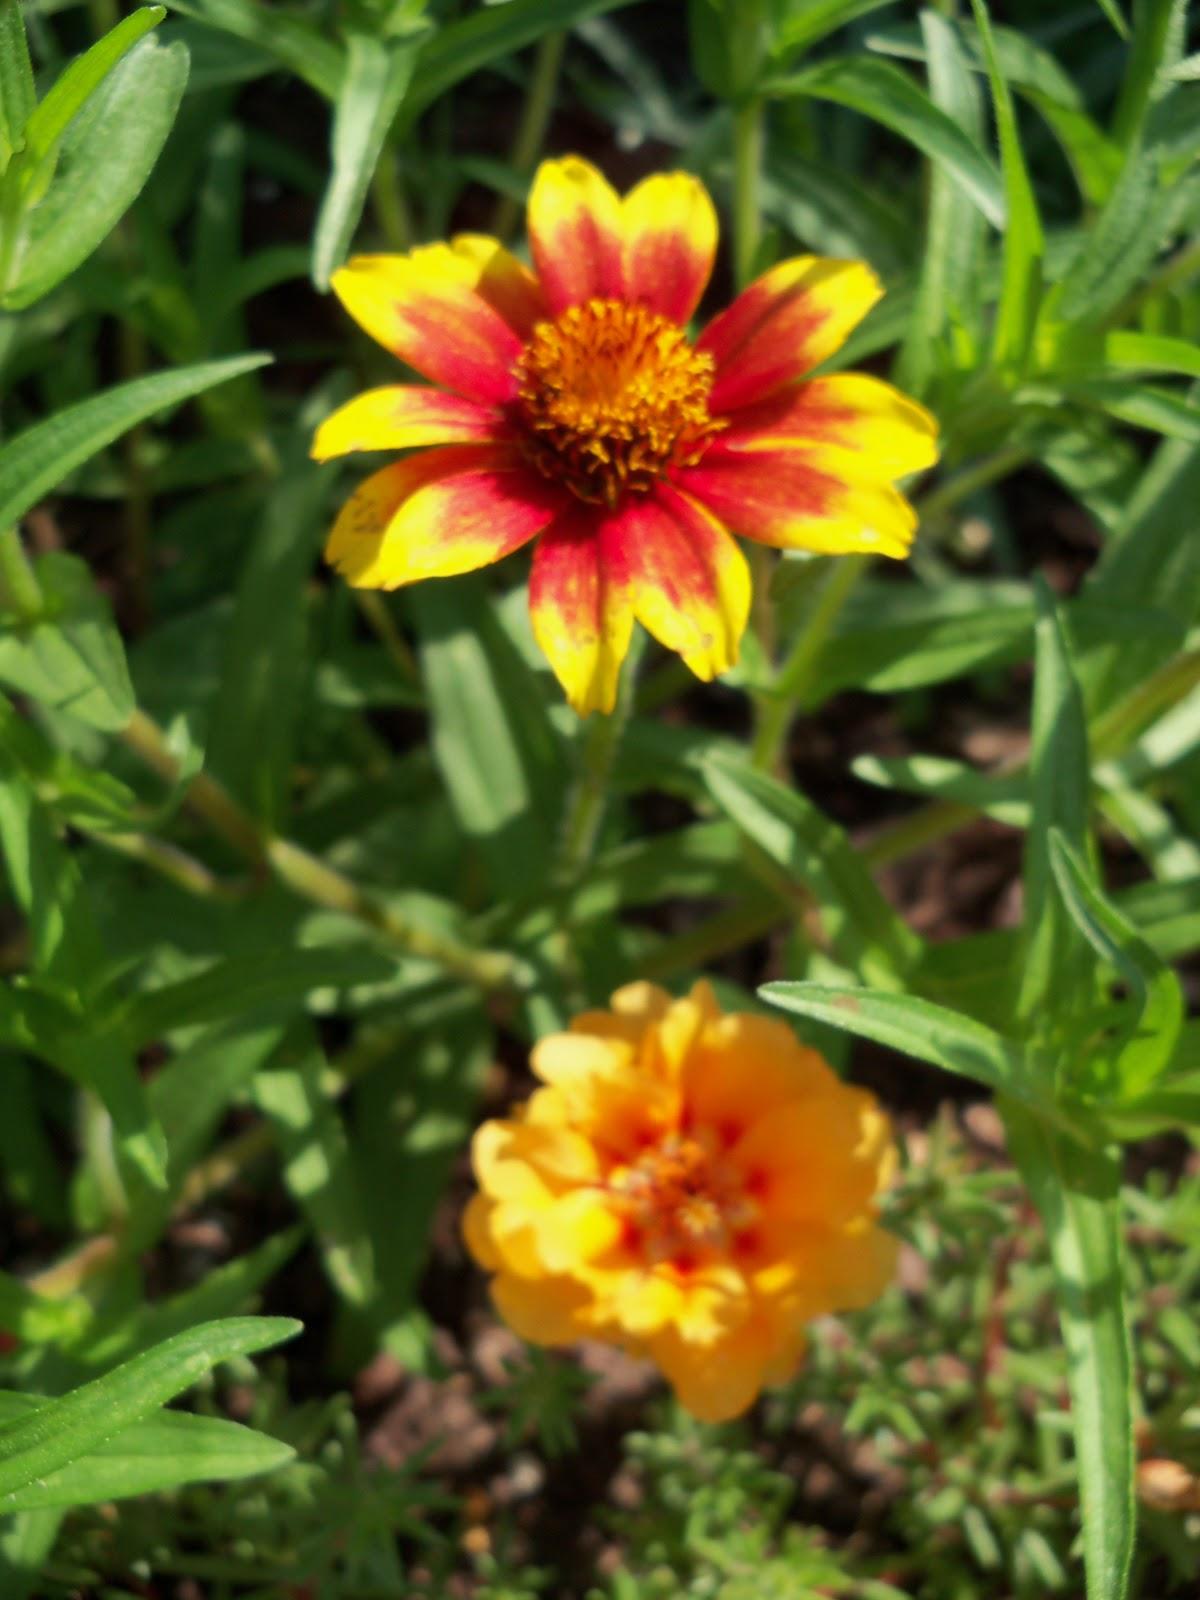 Gardening 2010, Part Two - 101_2588.JPG